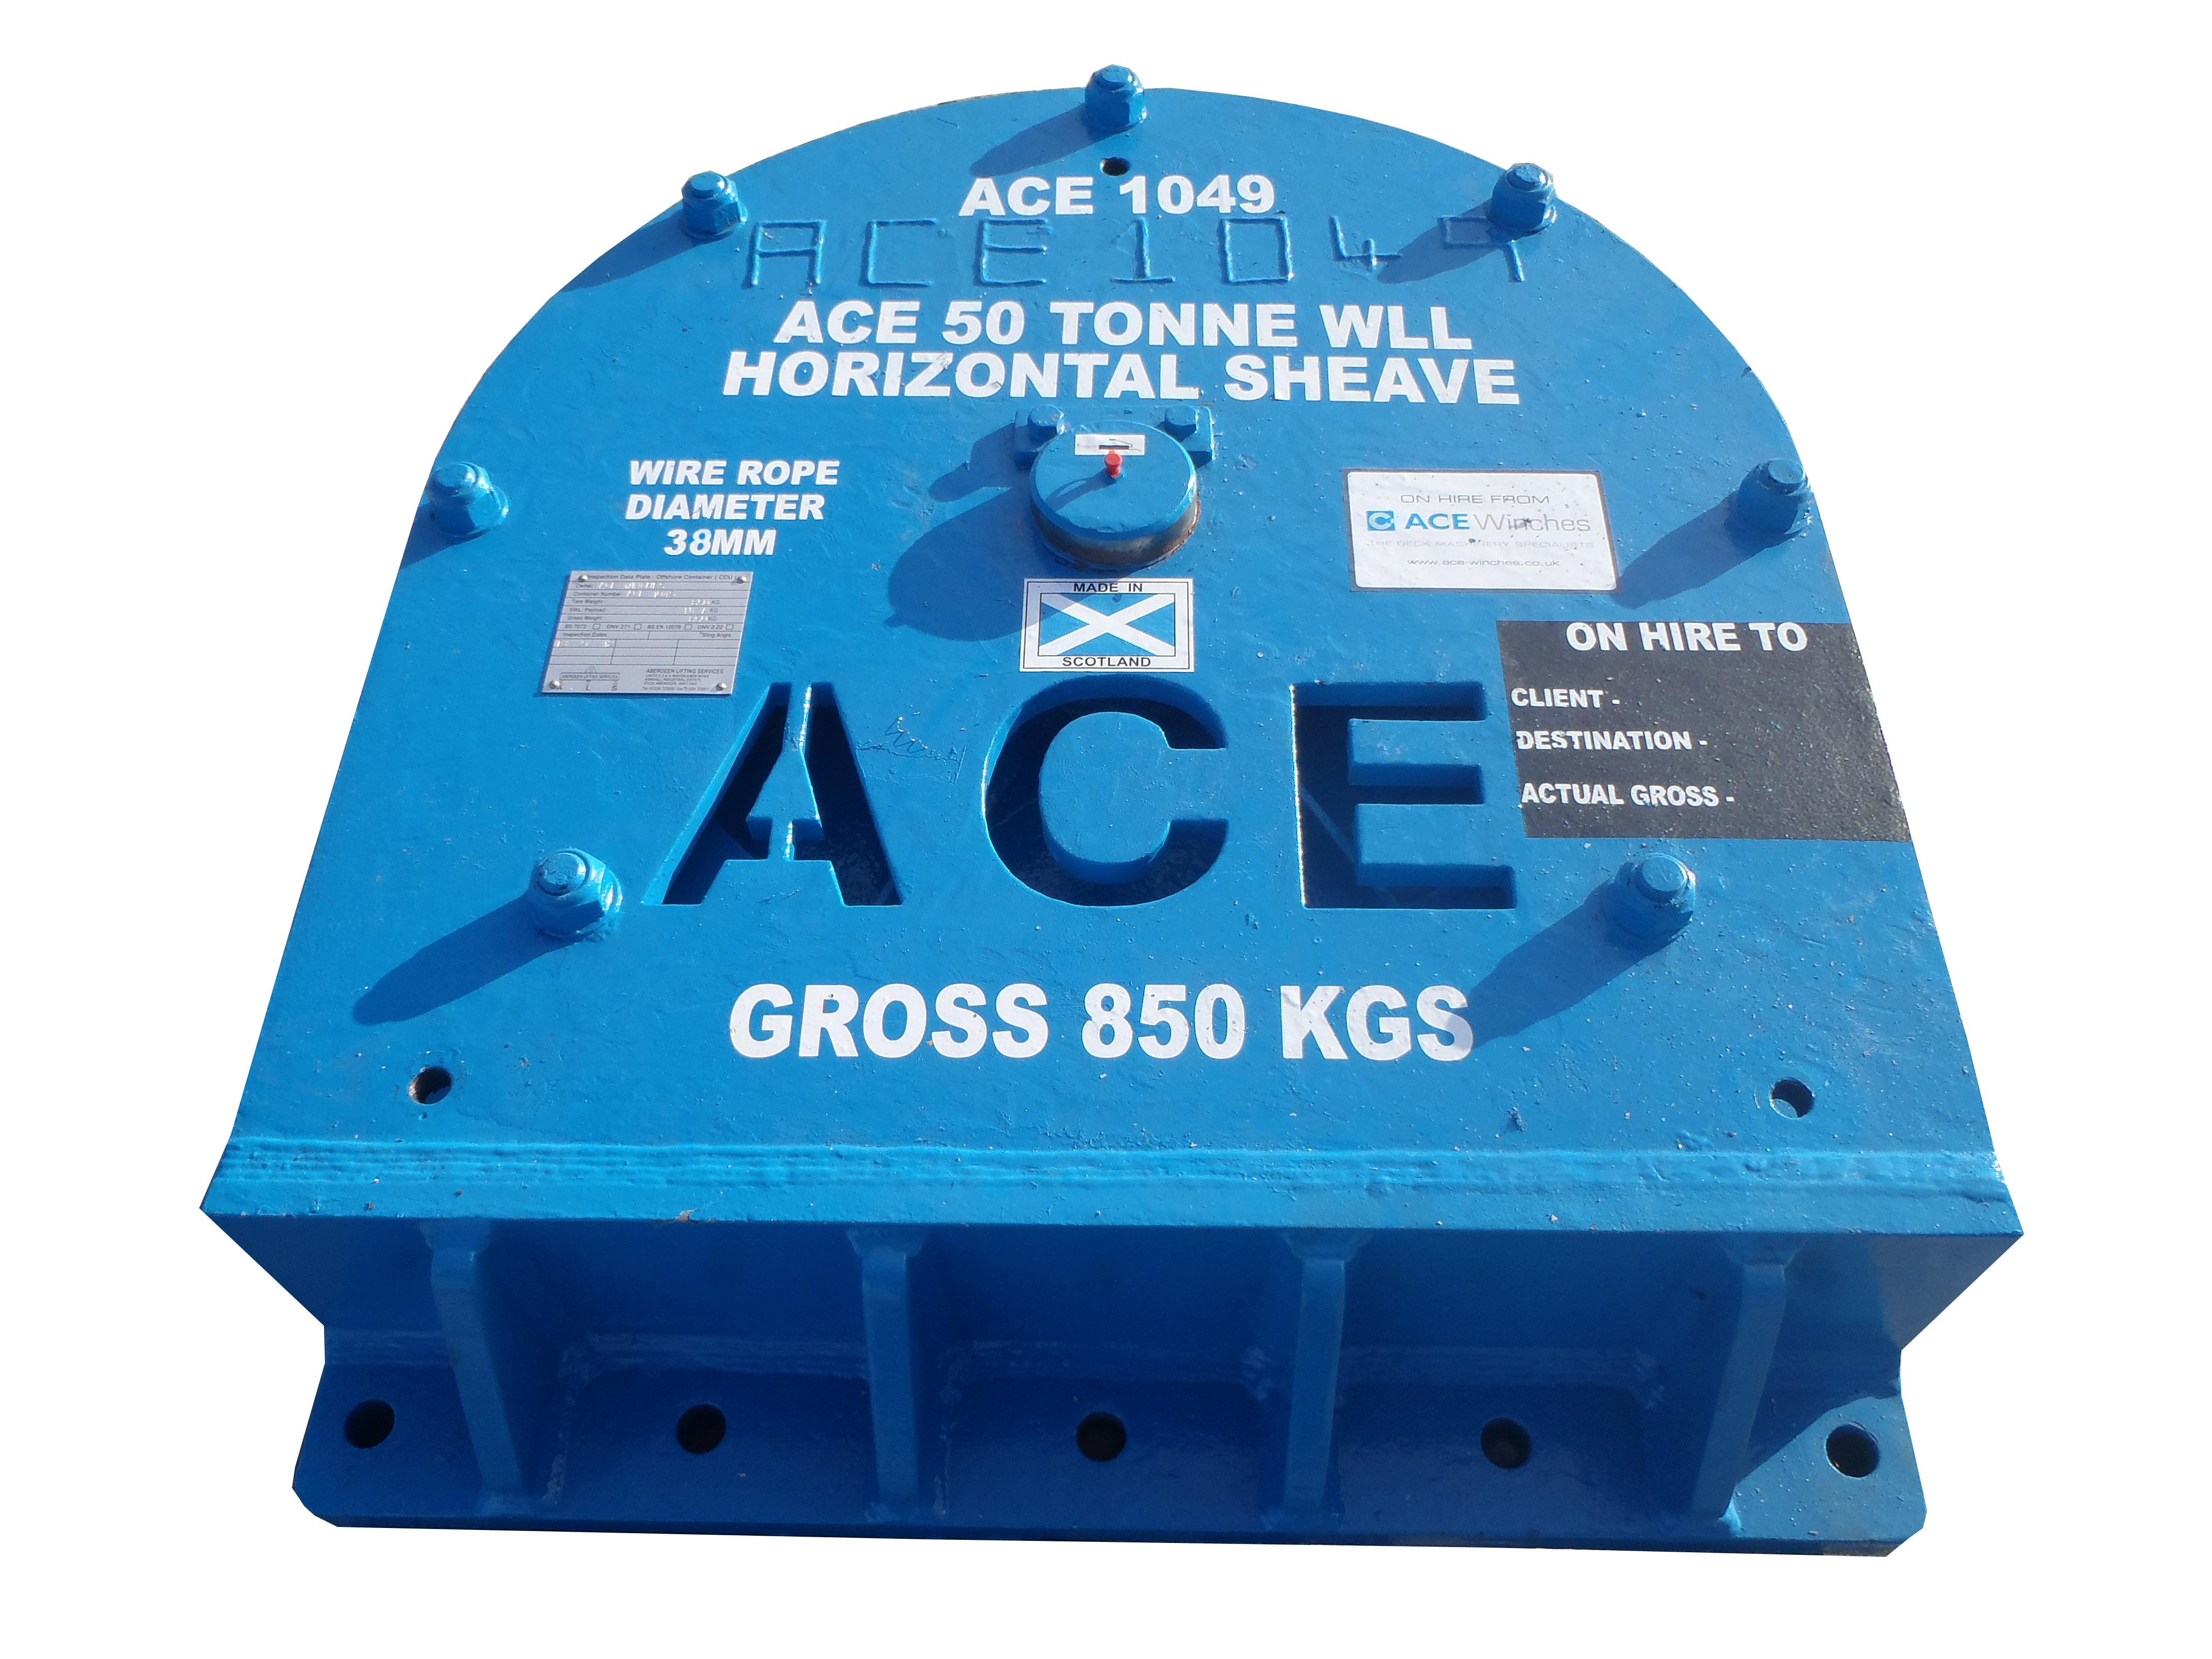 ACE 50 Tonne SWL at 90 Degrees Zone 2 Horizontal Sheave